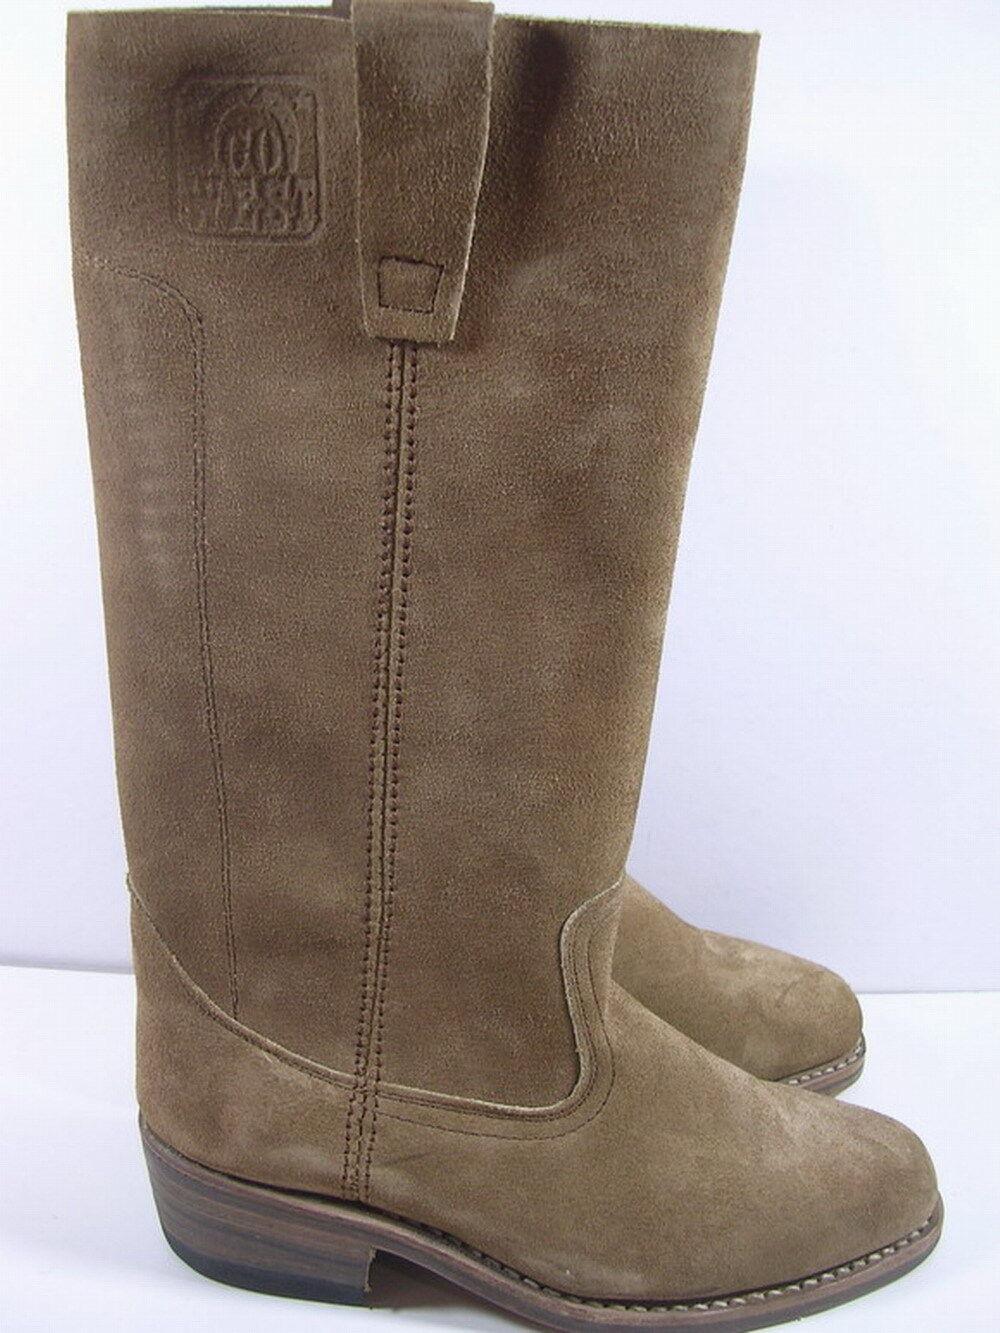 Grandes zapatos con descuento BOTTES GO WEST CUIR TAILLE 39 ANCIENNE VERS 1970/80